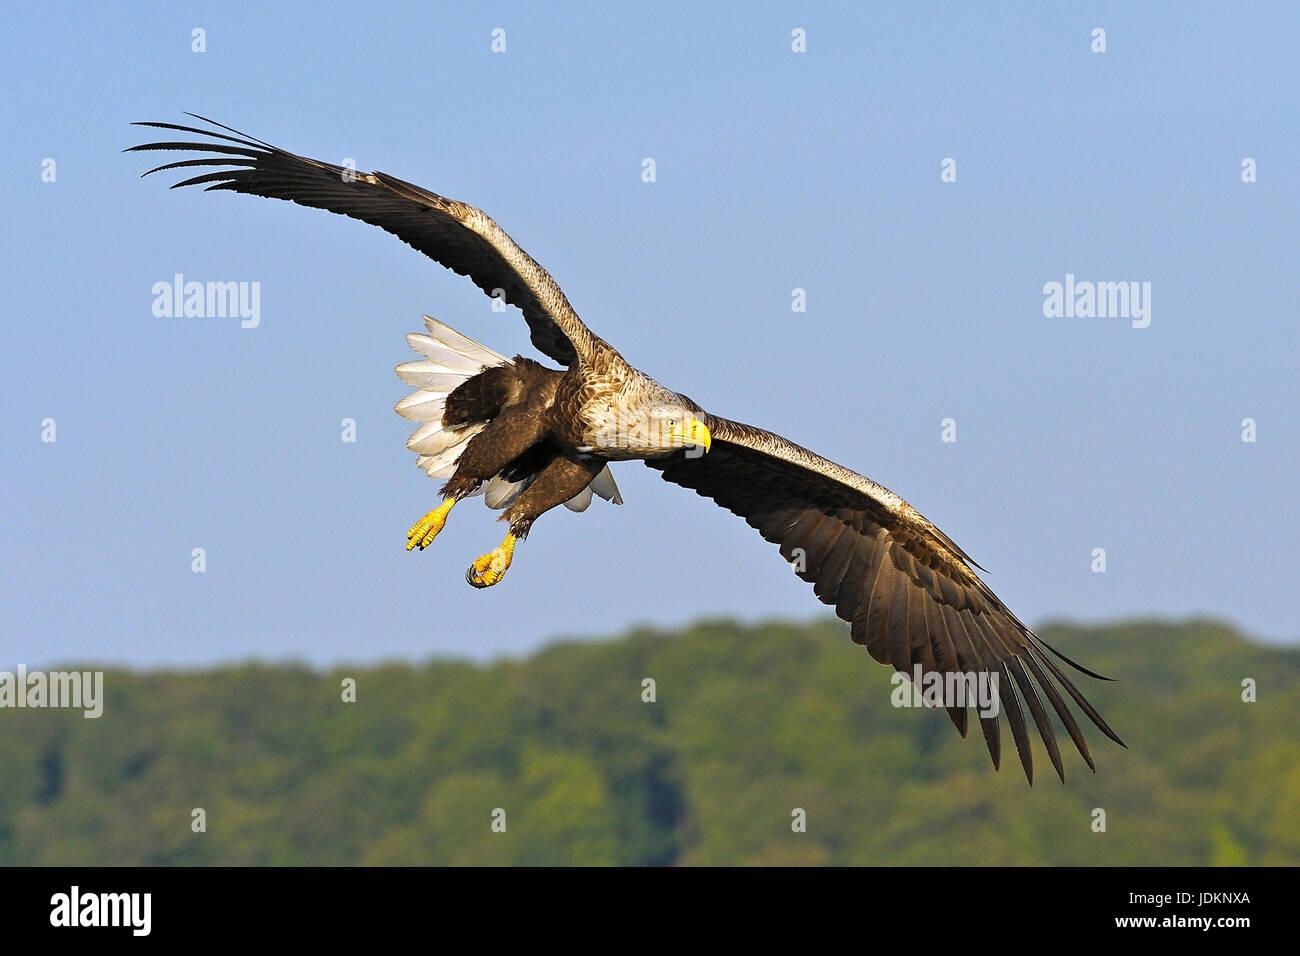 Seeadler / Haliaeetus albicilla / White-tailed Sea Eagle Stock Photo